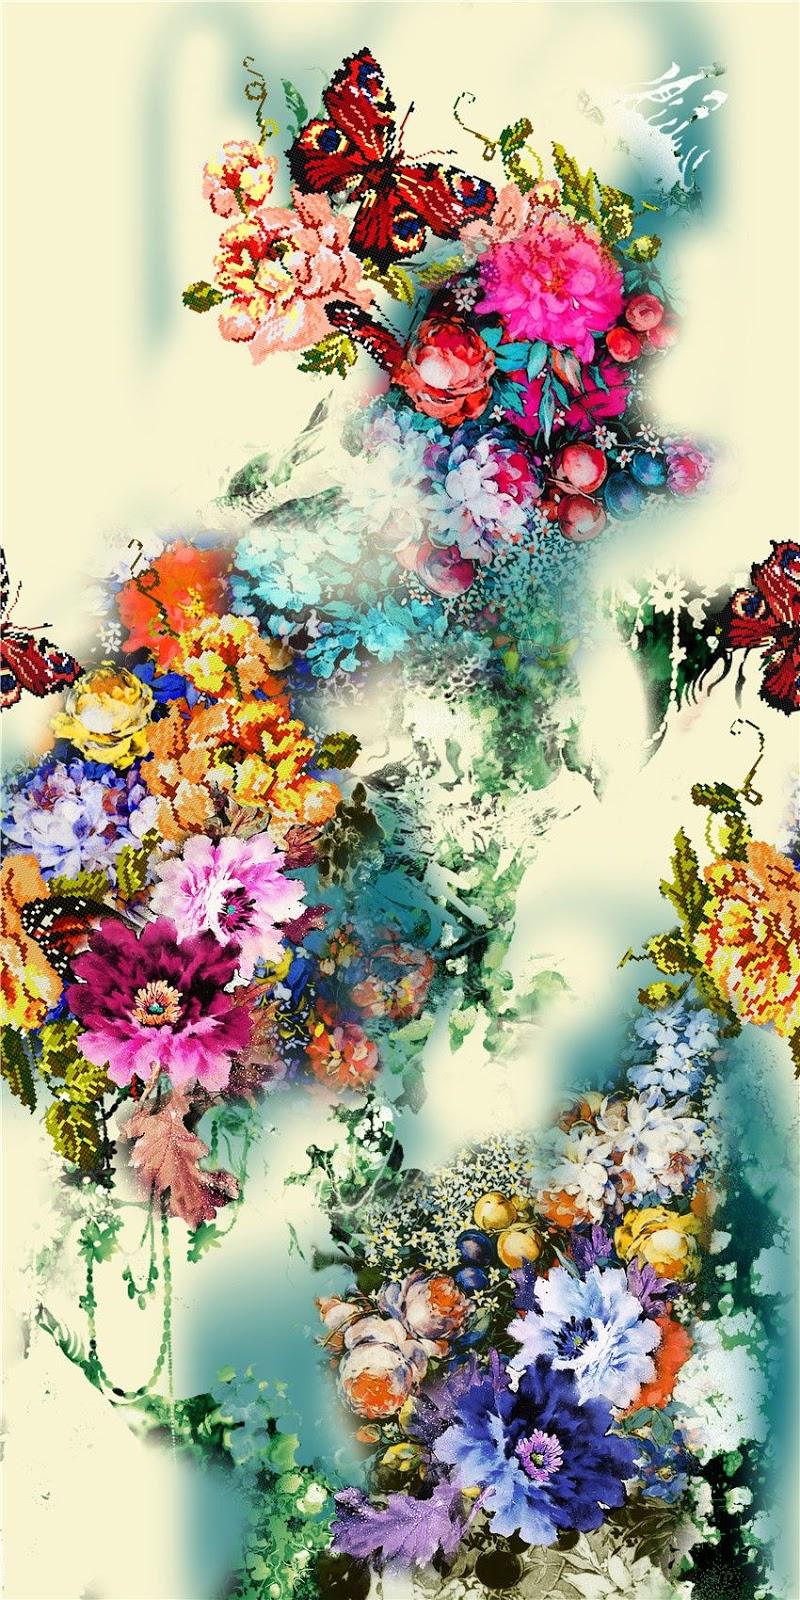 Painting Flower Design Digital Print 1 Blisse Design Studio